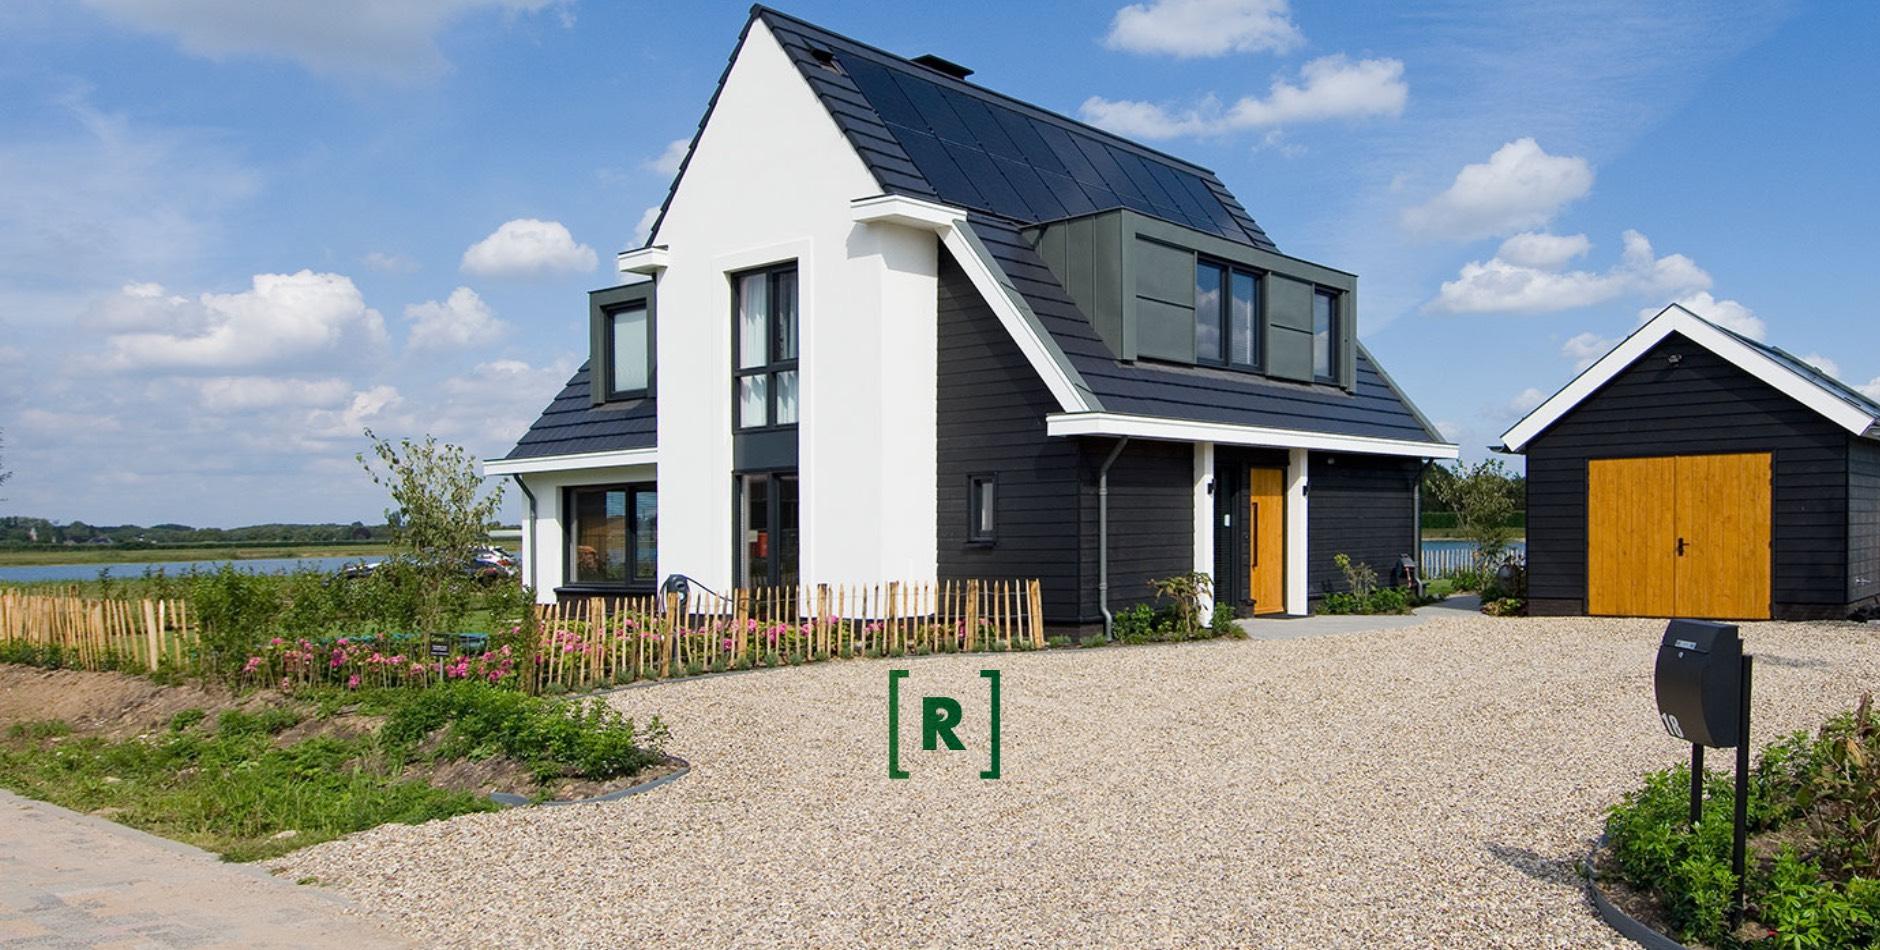 Groenr Exclusieve tuinarchitect_tuinontwerper_Hovenier_Gelderland_Nijmegen_Rosendaal_Arnhem_Lent_eclusieve tuinen_strandtuin_ibiza_Wonen aan het water_waalsprong_05b Architect_Nobbenhuis